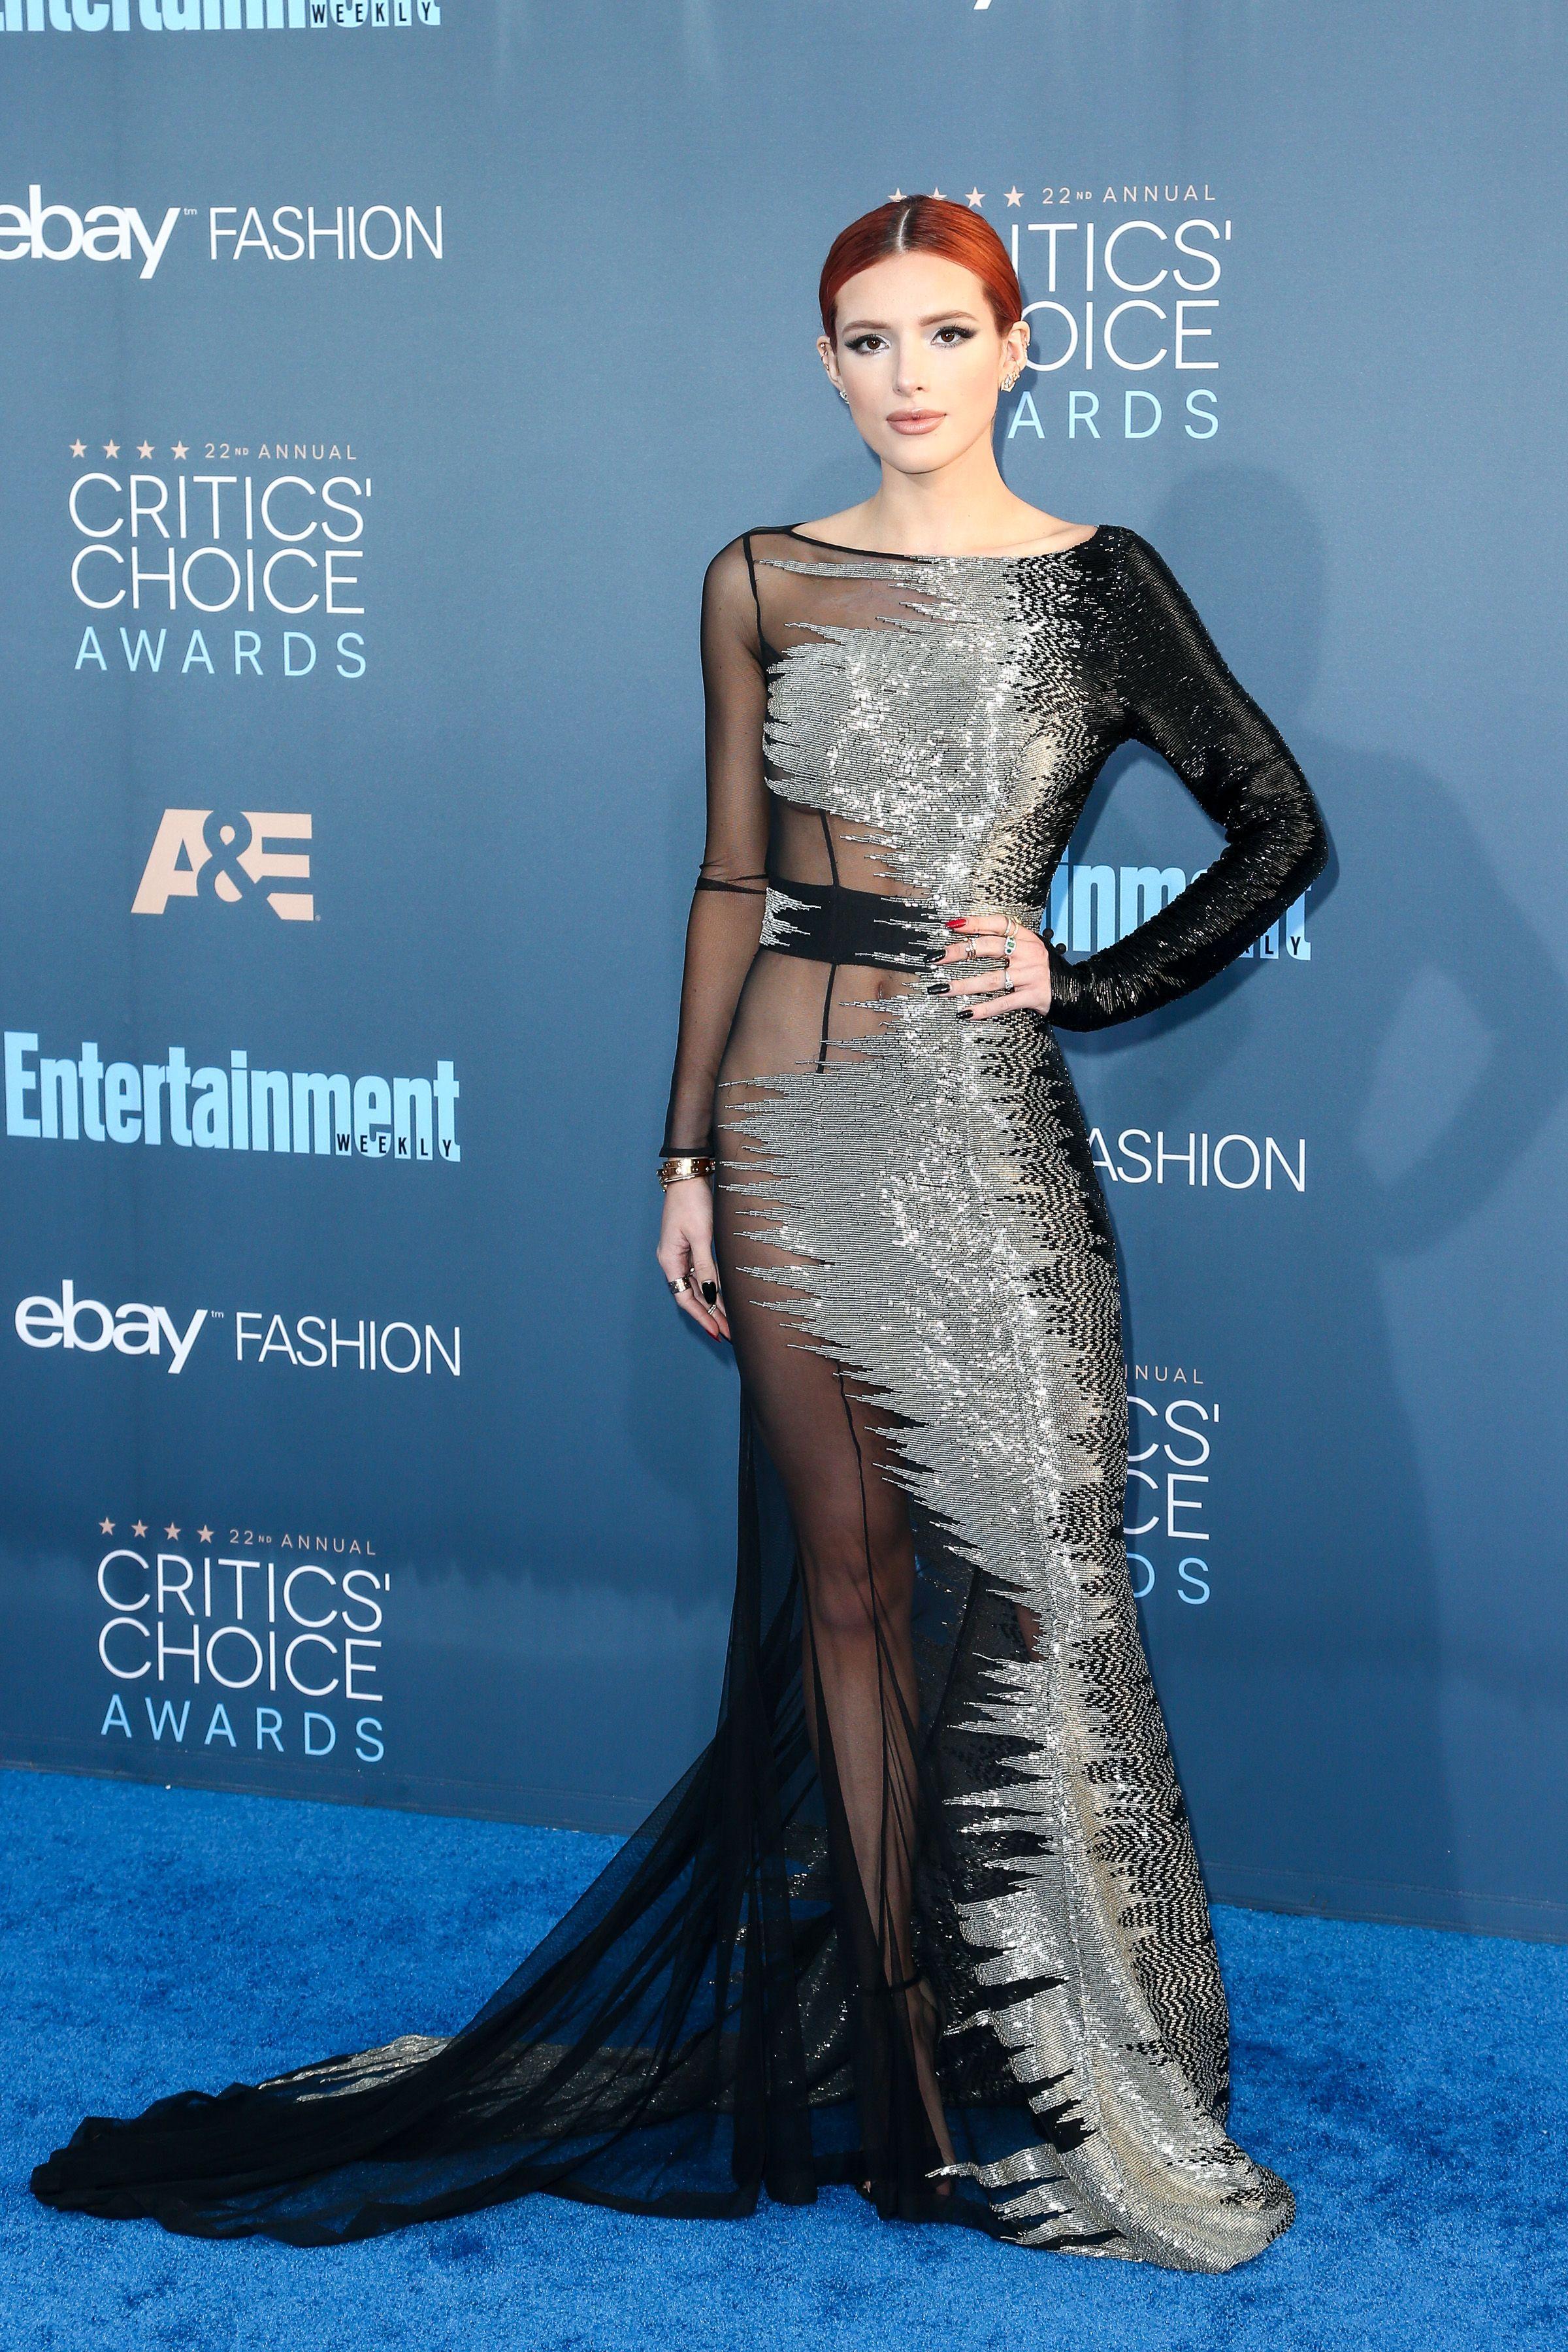 Bella Thorne at the 22nd Annual Critics' Choice Awards. Photo by John Salangsang/BFA/REX/Shutterstock